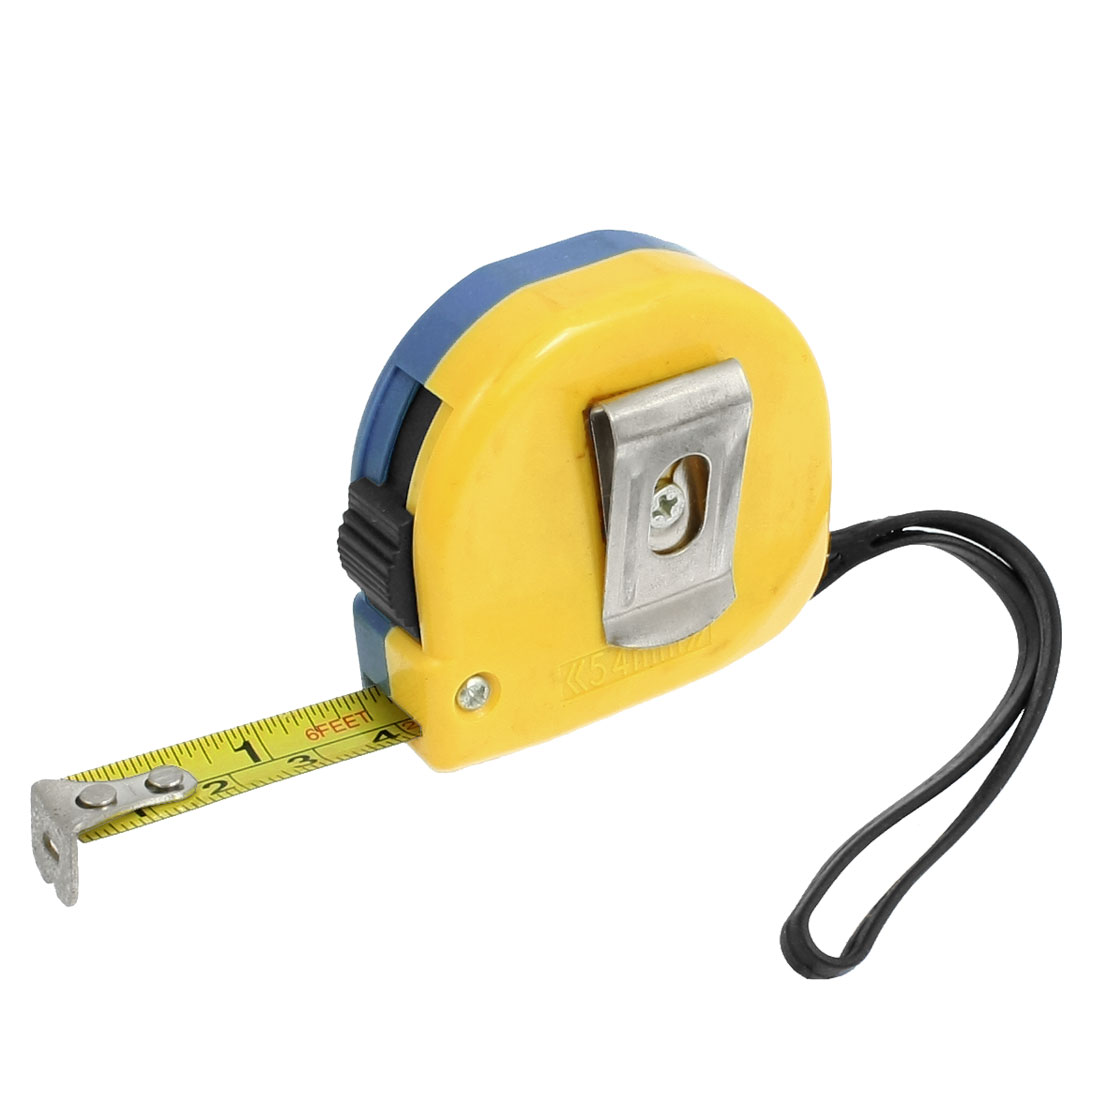 2M Yellow Blue Case Back Clip Ruler Tape Measure w Black Strap